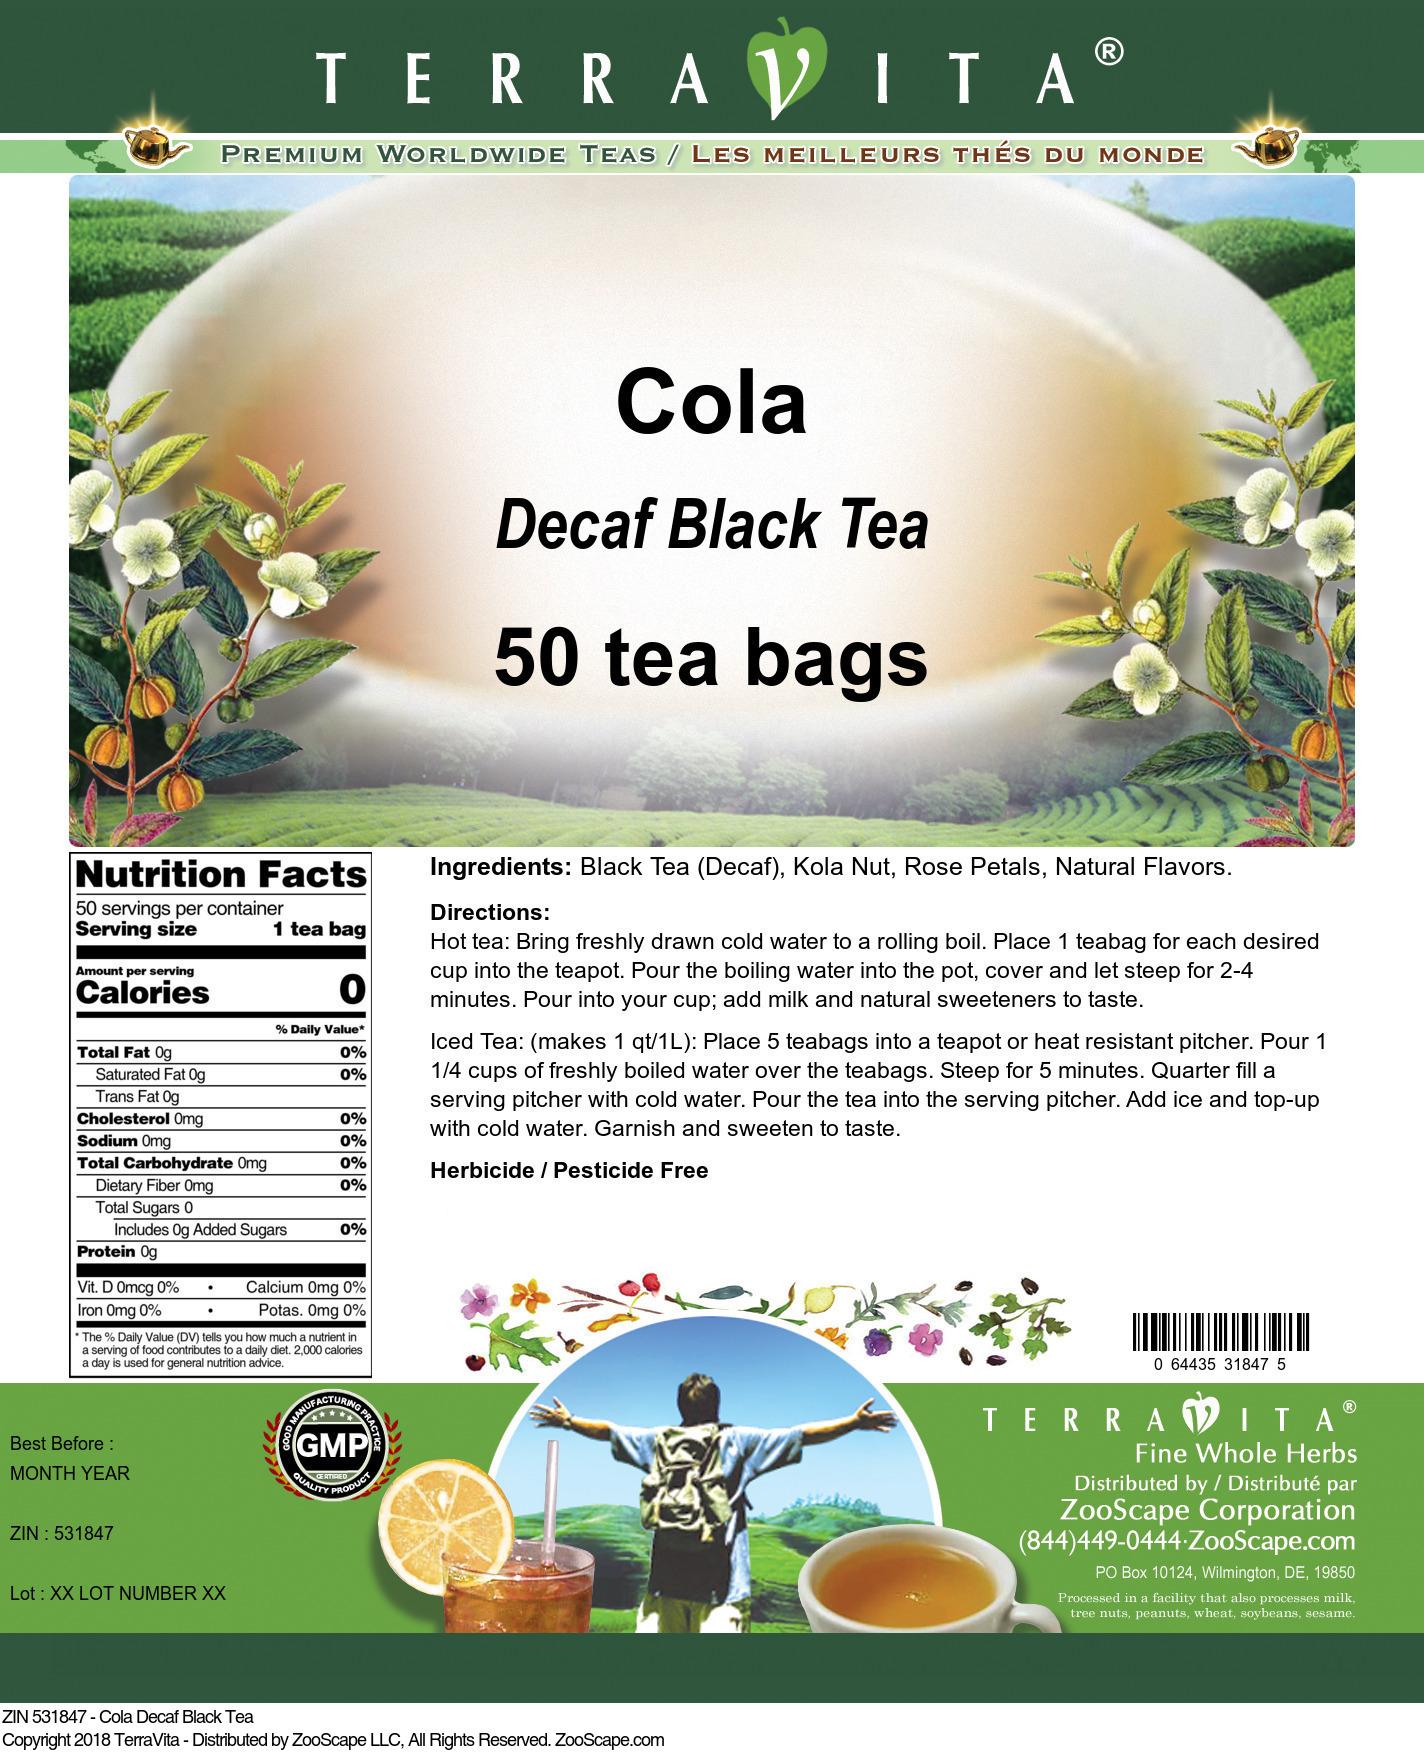 Cola Decaf Black Tea